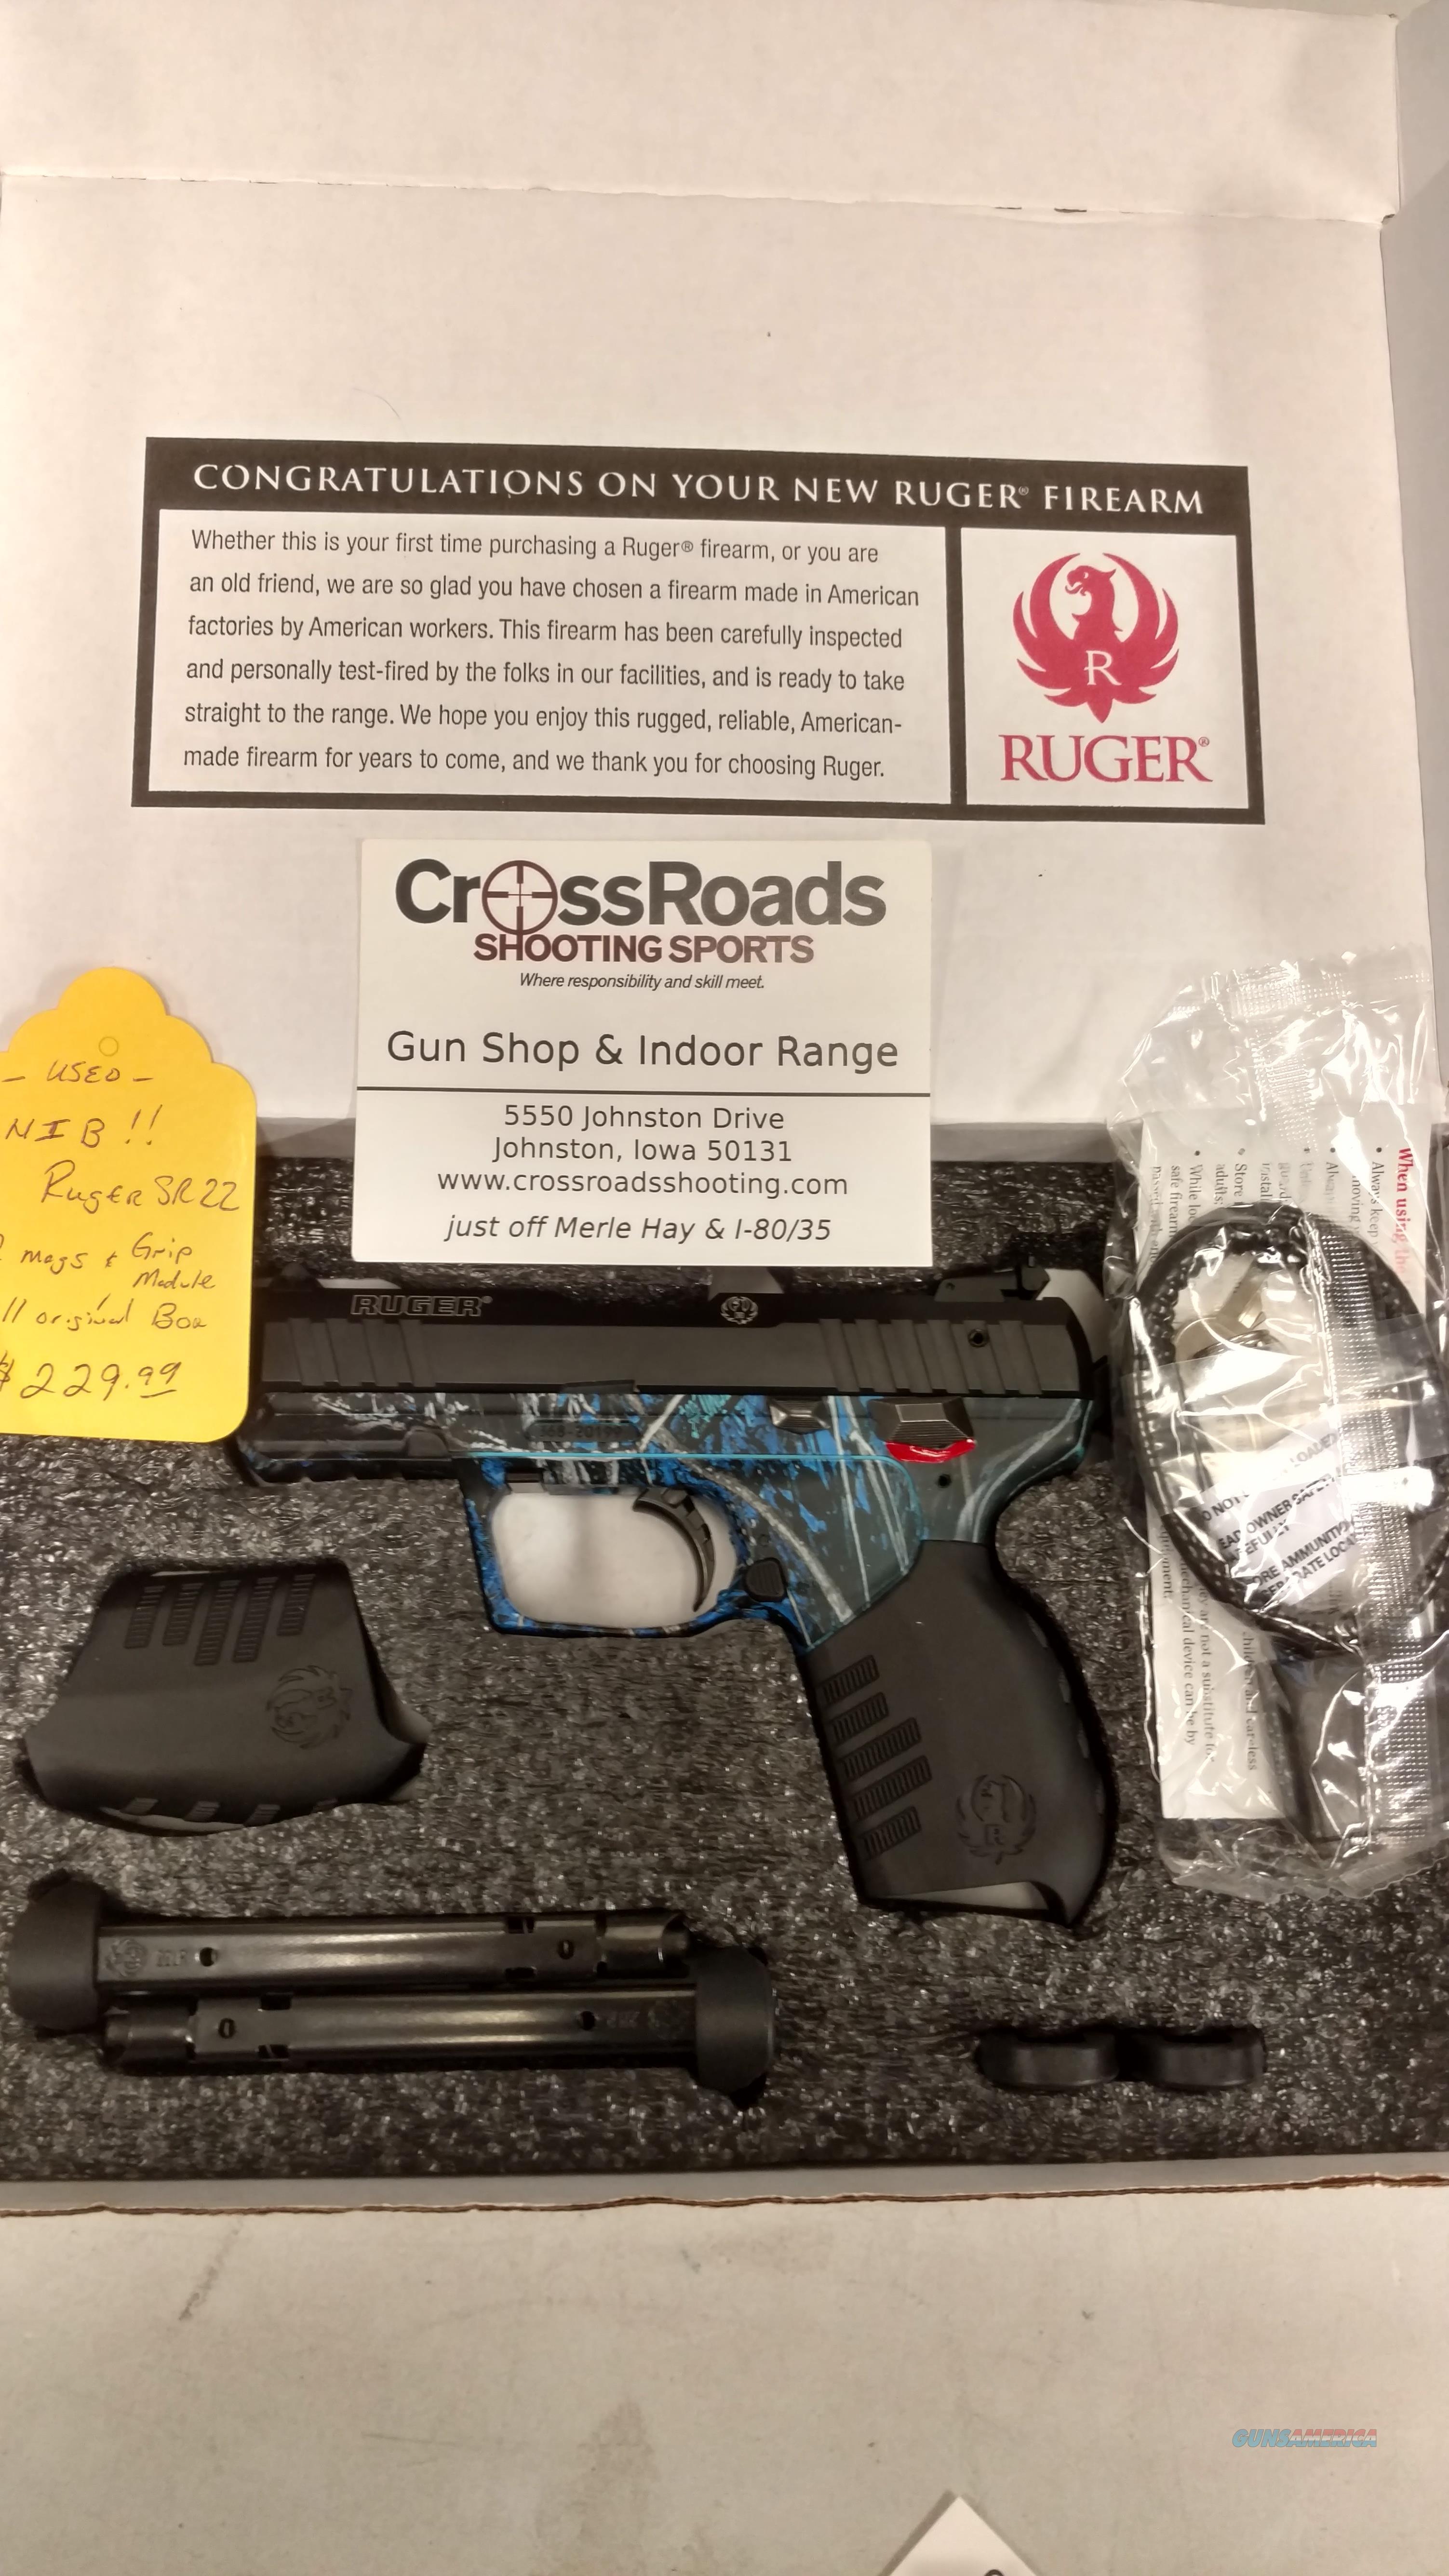 Used Ruger SR22 Blue Camo 22LR w/2 Mags!  Guns > Pistols > Ruger Semi-Auto Pistols > SR Family > SR22